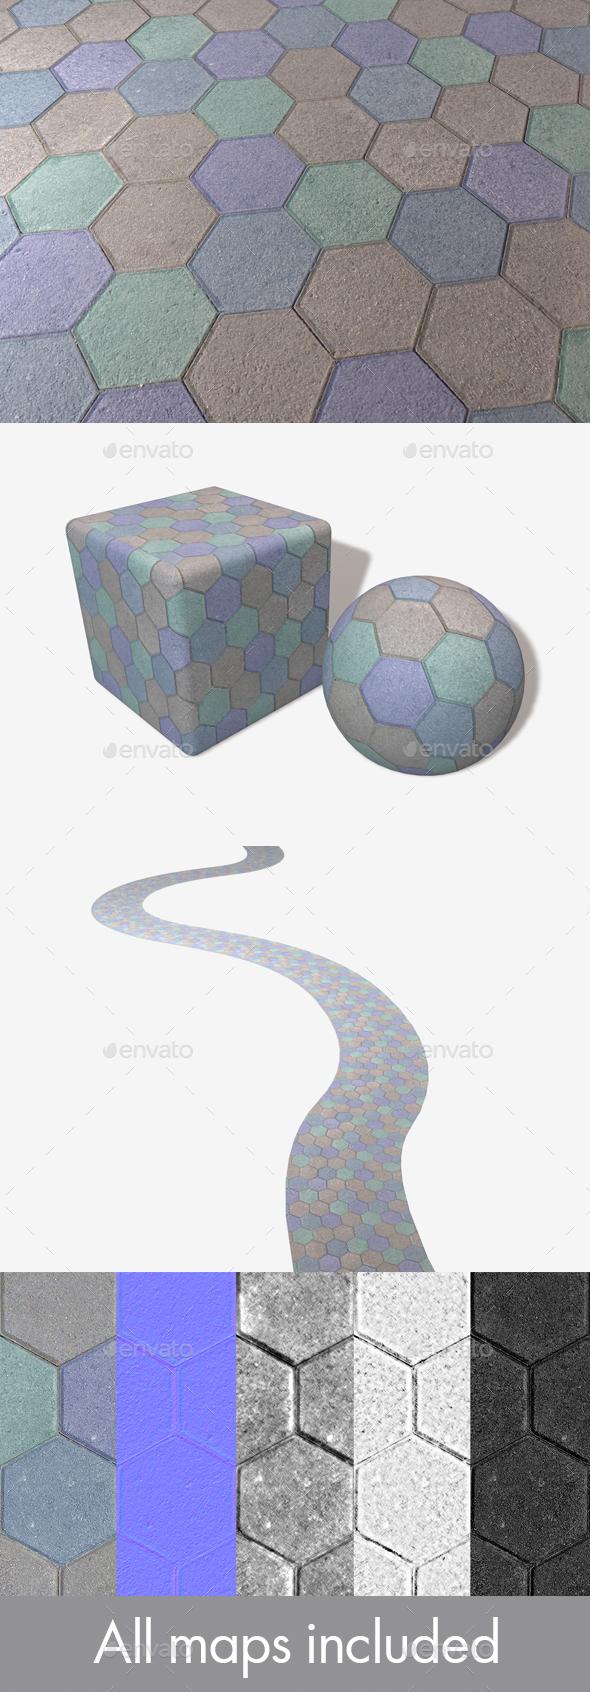 3DOcean Blue Hexagon Paving Slabs Texture 20014301